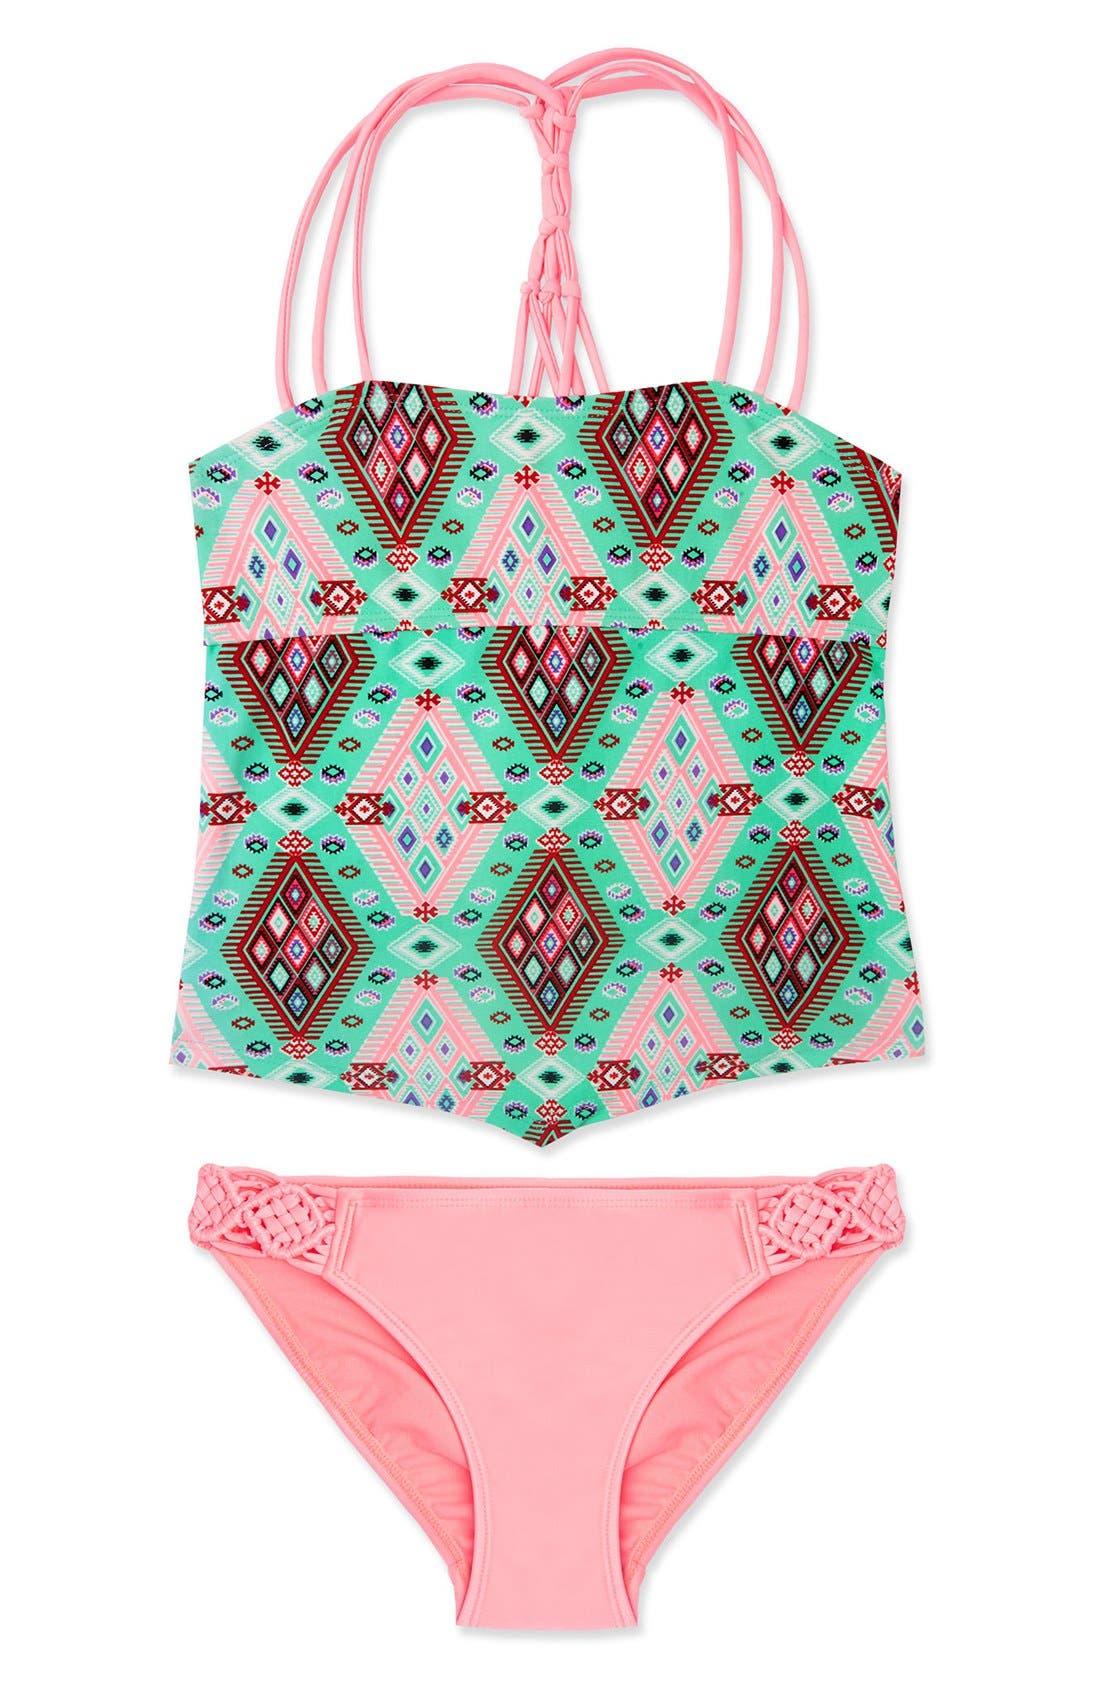 Main Image - Gossip Girl 'Aztec Harvest' Two-Piece Swimsuit (Big Girls)